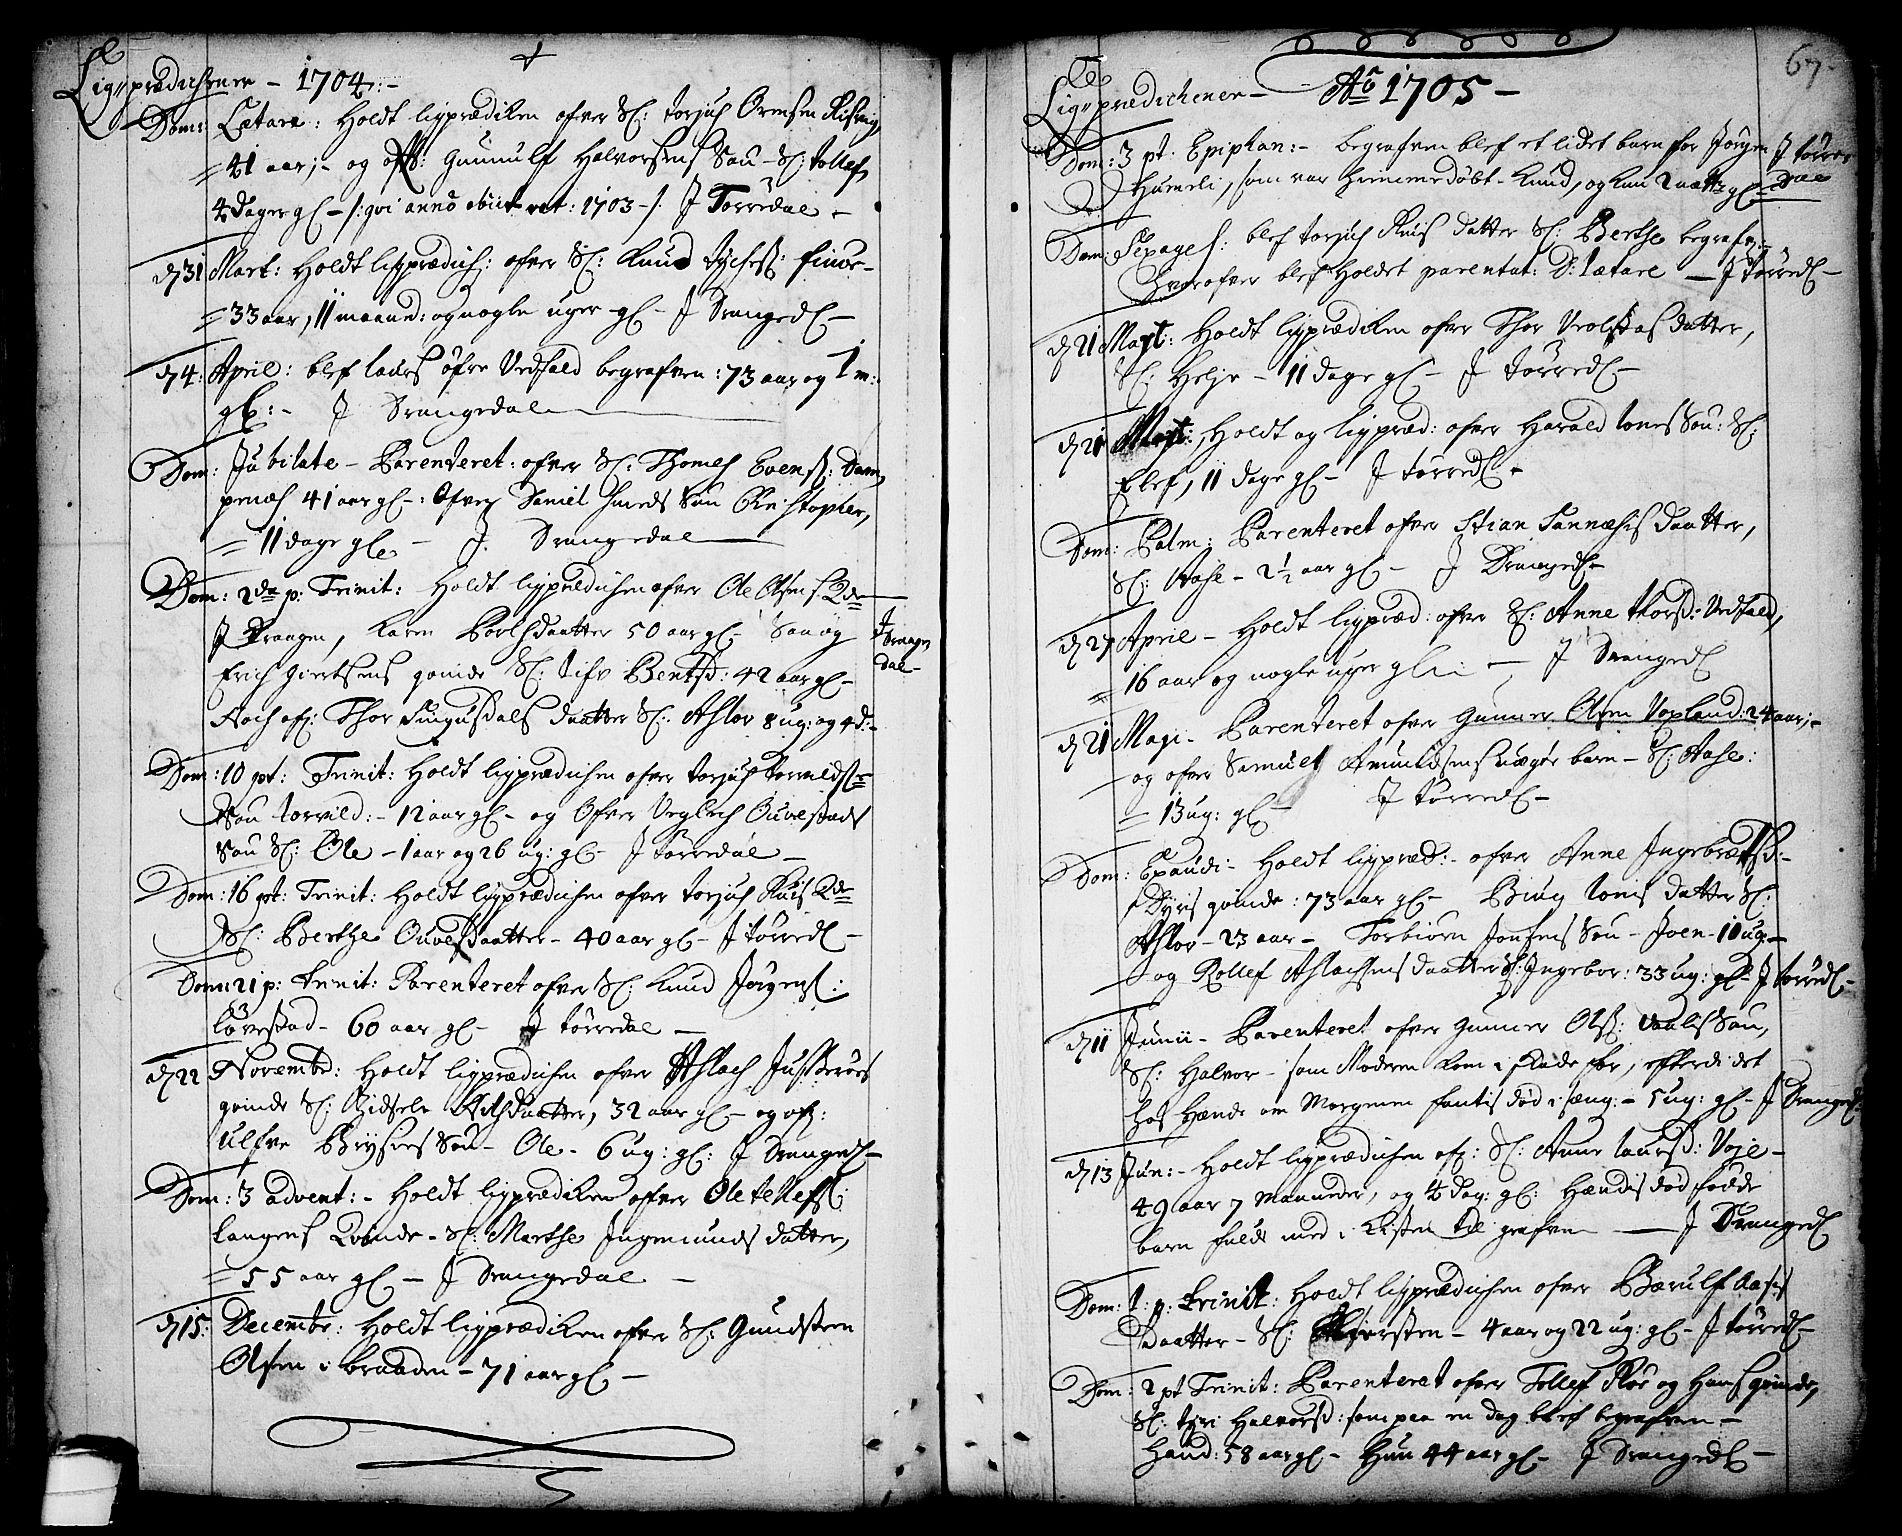 SAKO, Drangedal kirkebøker, F/Fa/L0001: Ministerialbok nr. 1, 1697-1767, s. 67